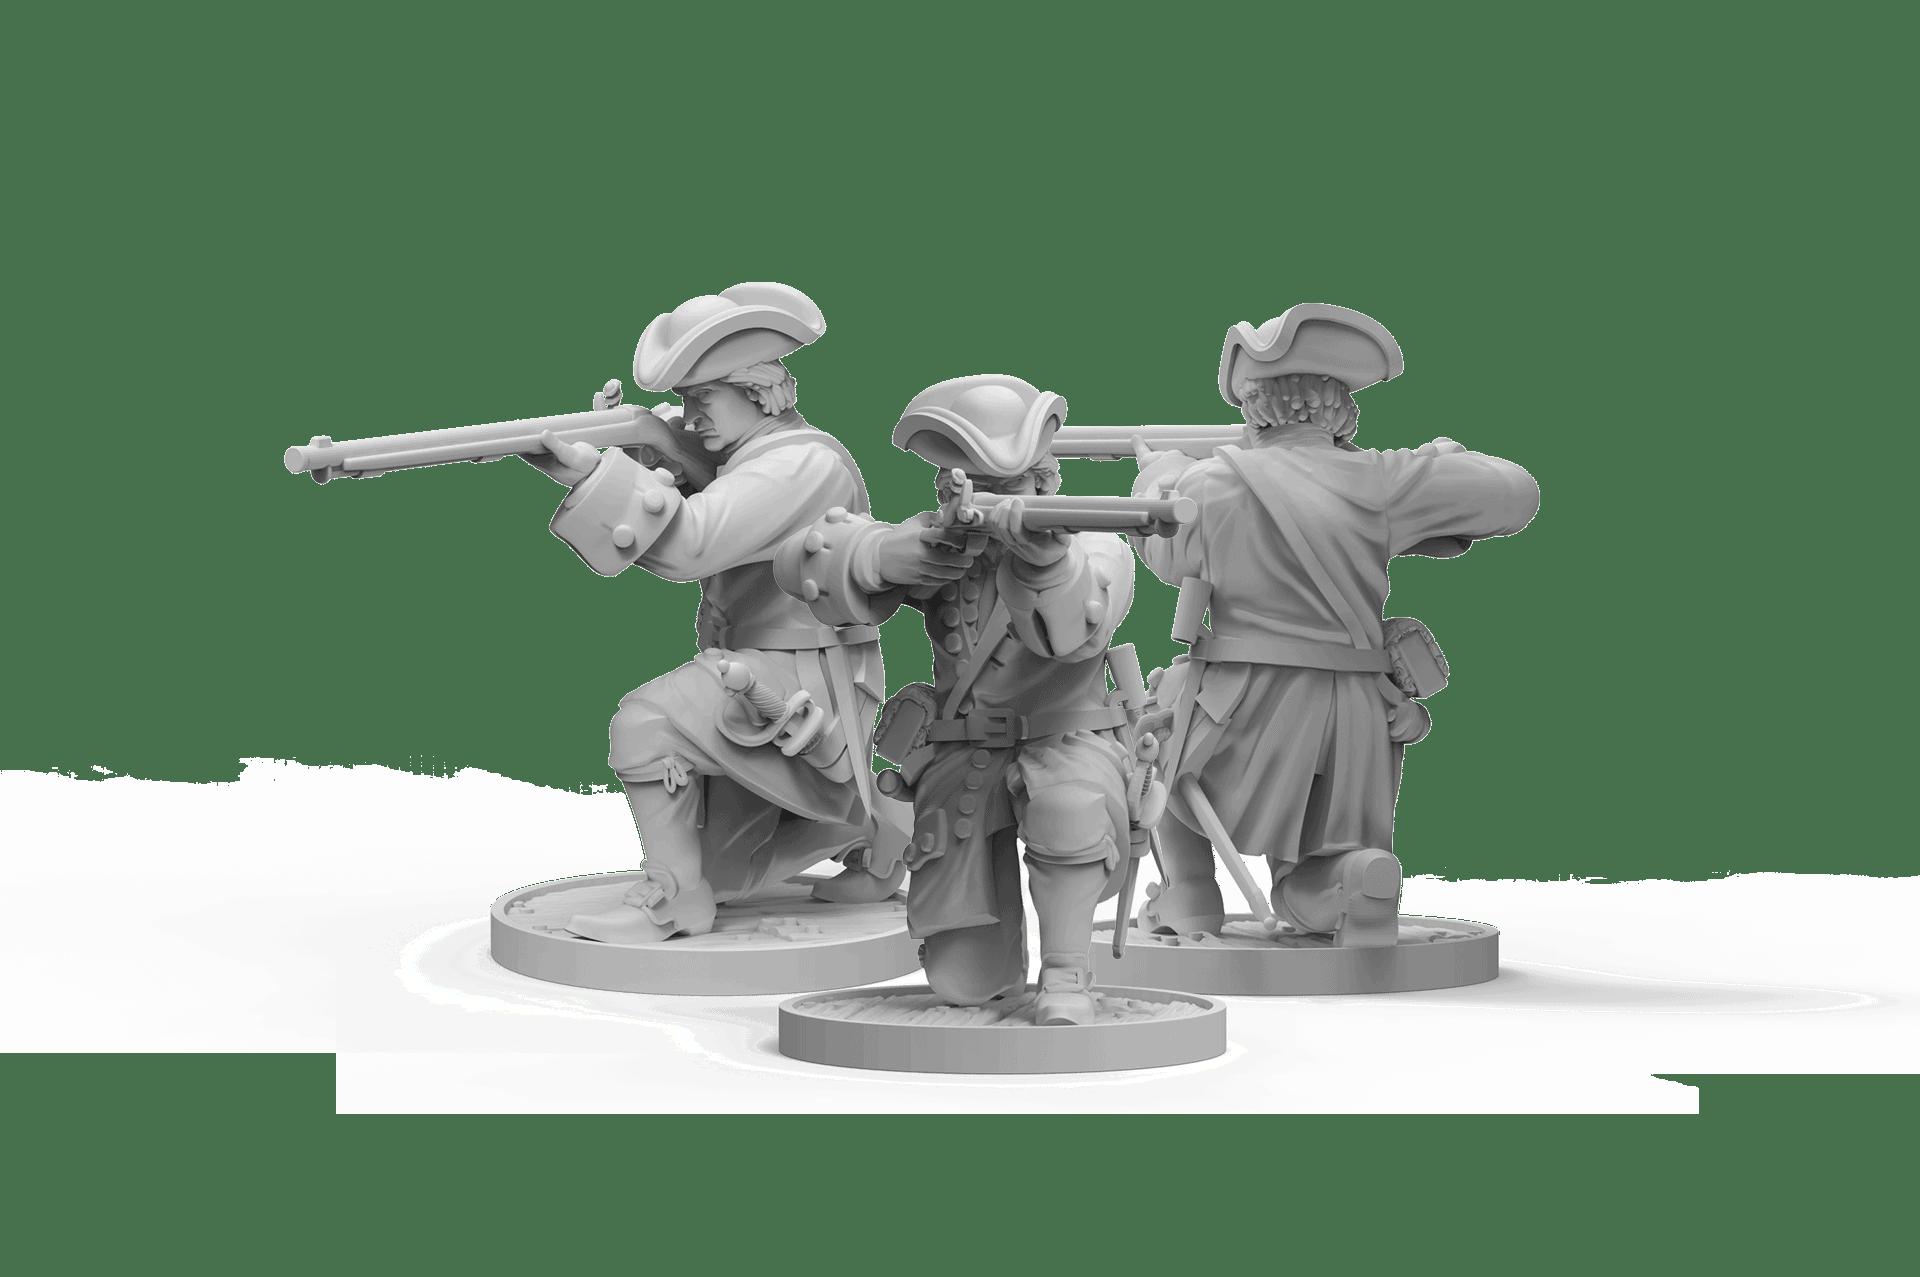 soldiers-4.png?fit=1920%2C1277&ssl=1